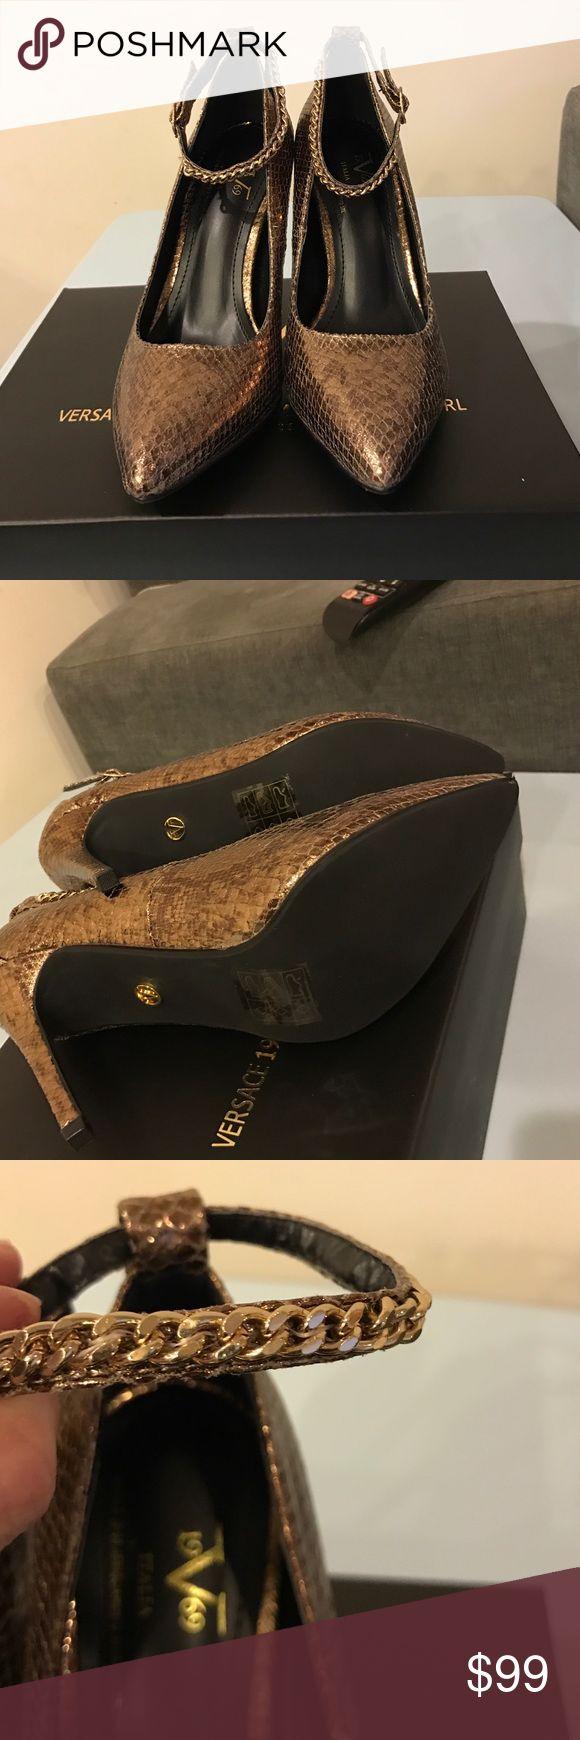 VERSACE 19.69 ABBIGLIAMENTO SPORTIVO srl brand 👠 Brand new, snake skin sexy shoes -Versace 1969 Abbigliamento SPORTIVO srl ❣️Shoes🌺🌺🌺🌺🌺🌺🌺🌺 bronze snake Versace Shoes Heels